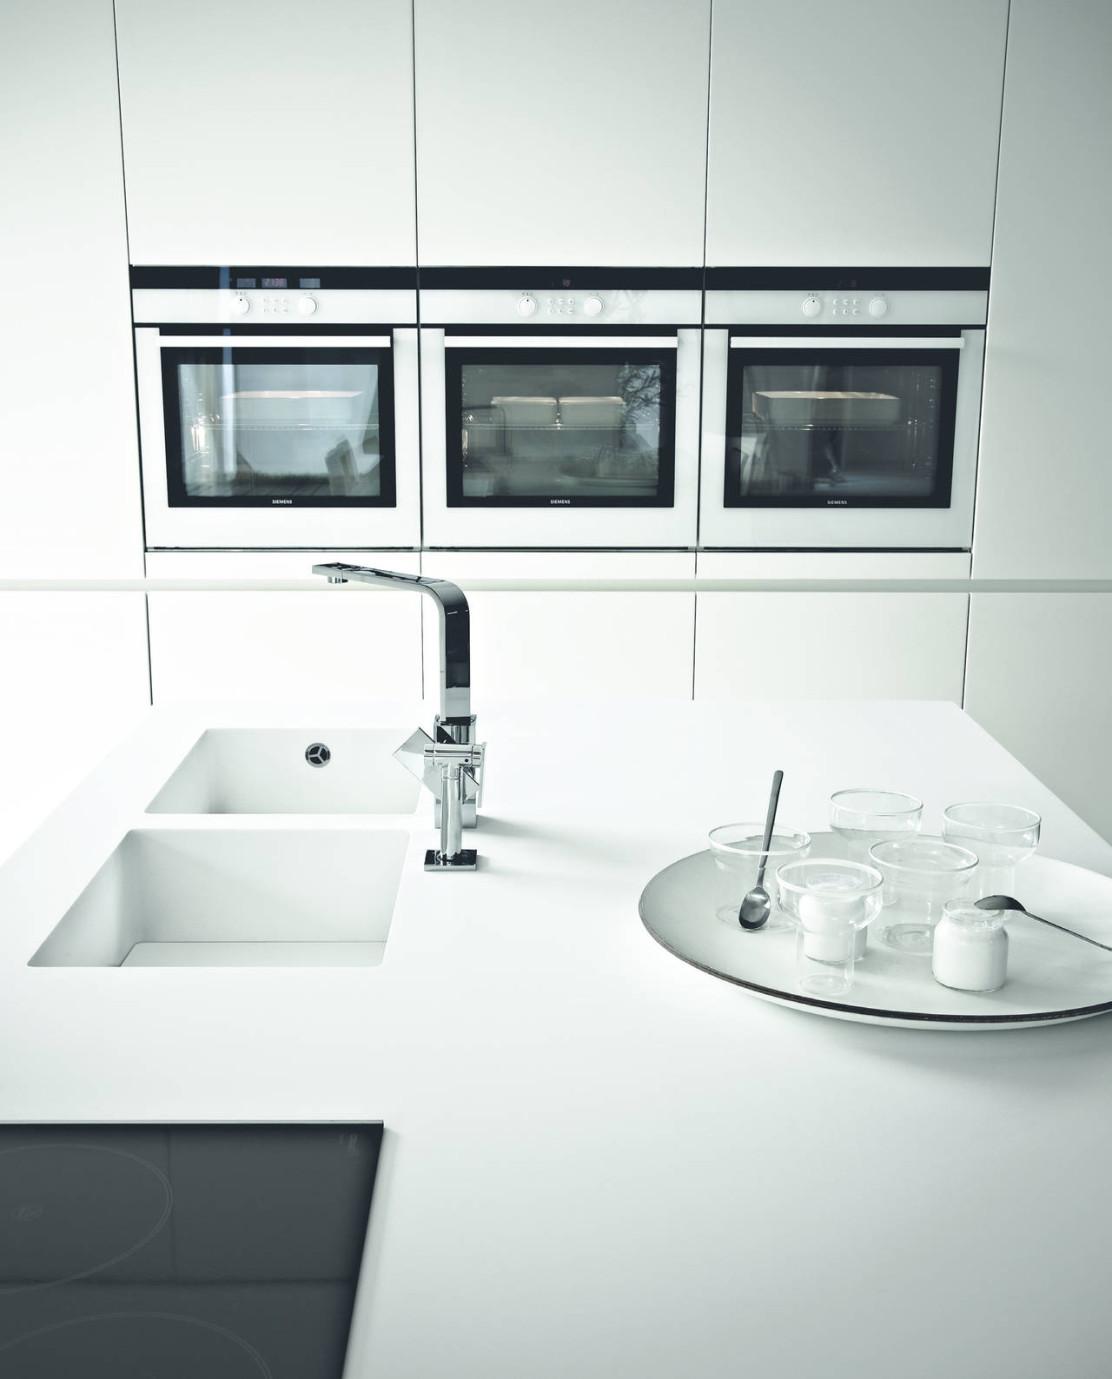 DuPont™ Corian® Per Le Cucine D'alta Gamma Varenna #596D72 1112 1379 Top Per Cucina Corian